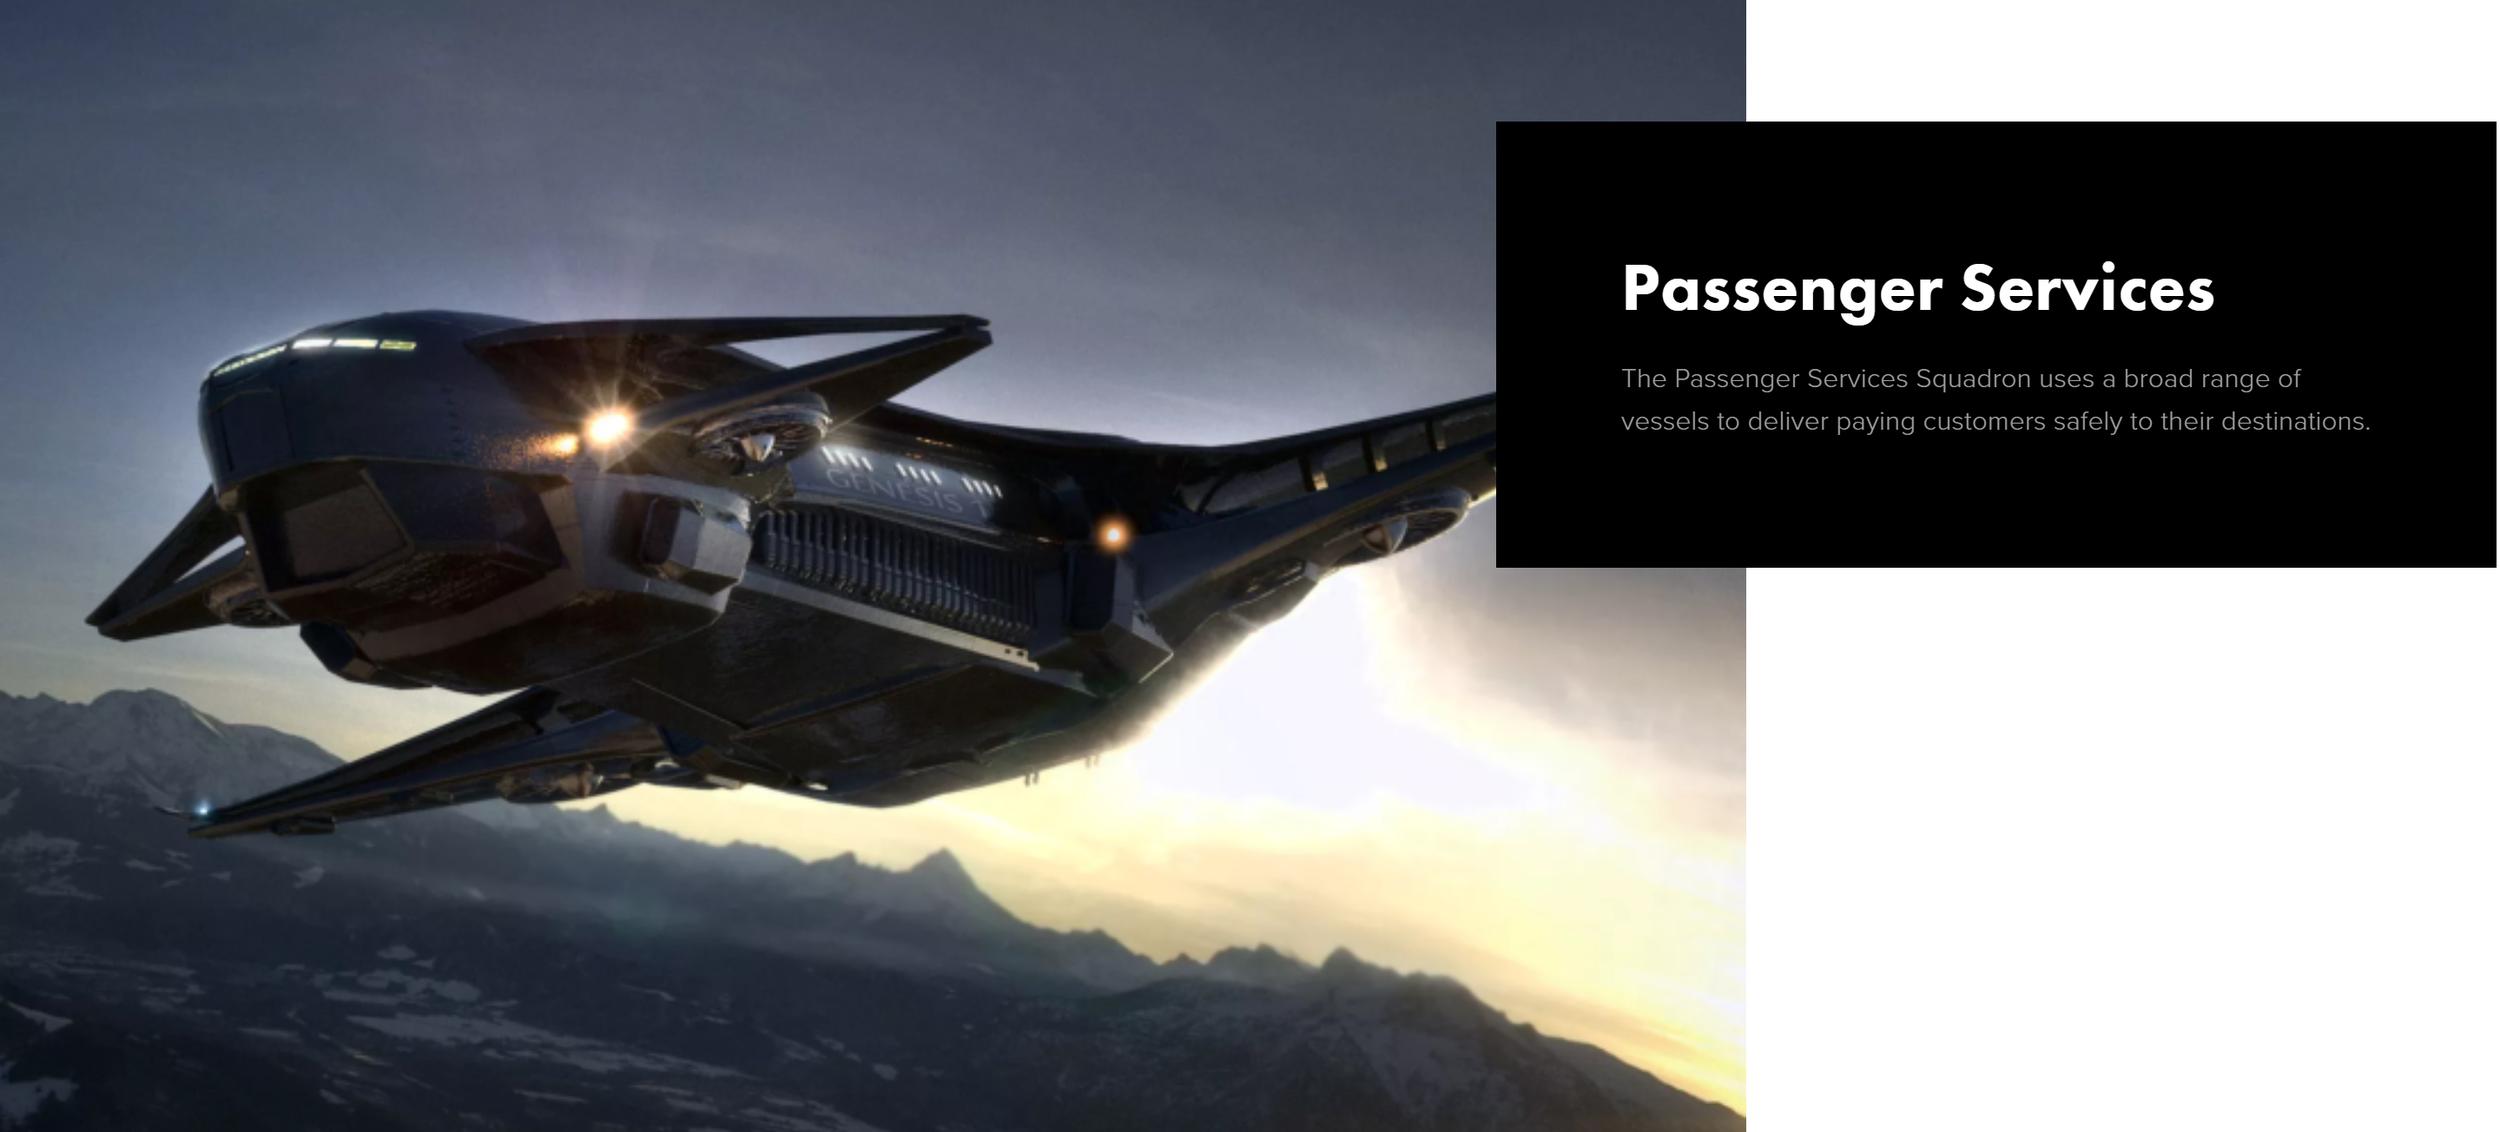 (Genesis Starliner Photo Courtesy of Crusader Industries)